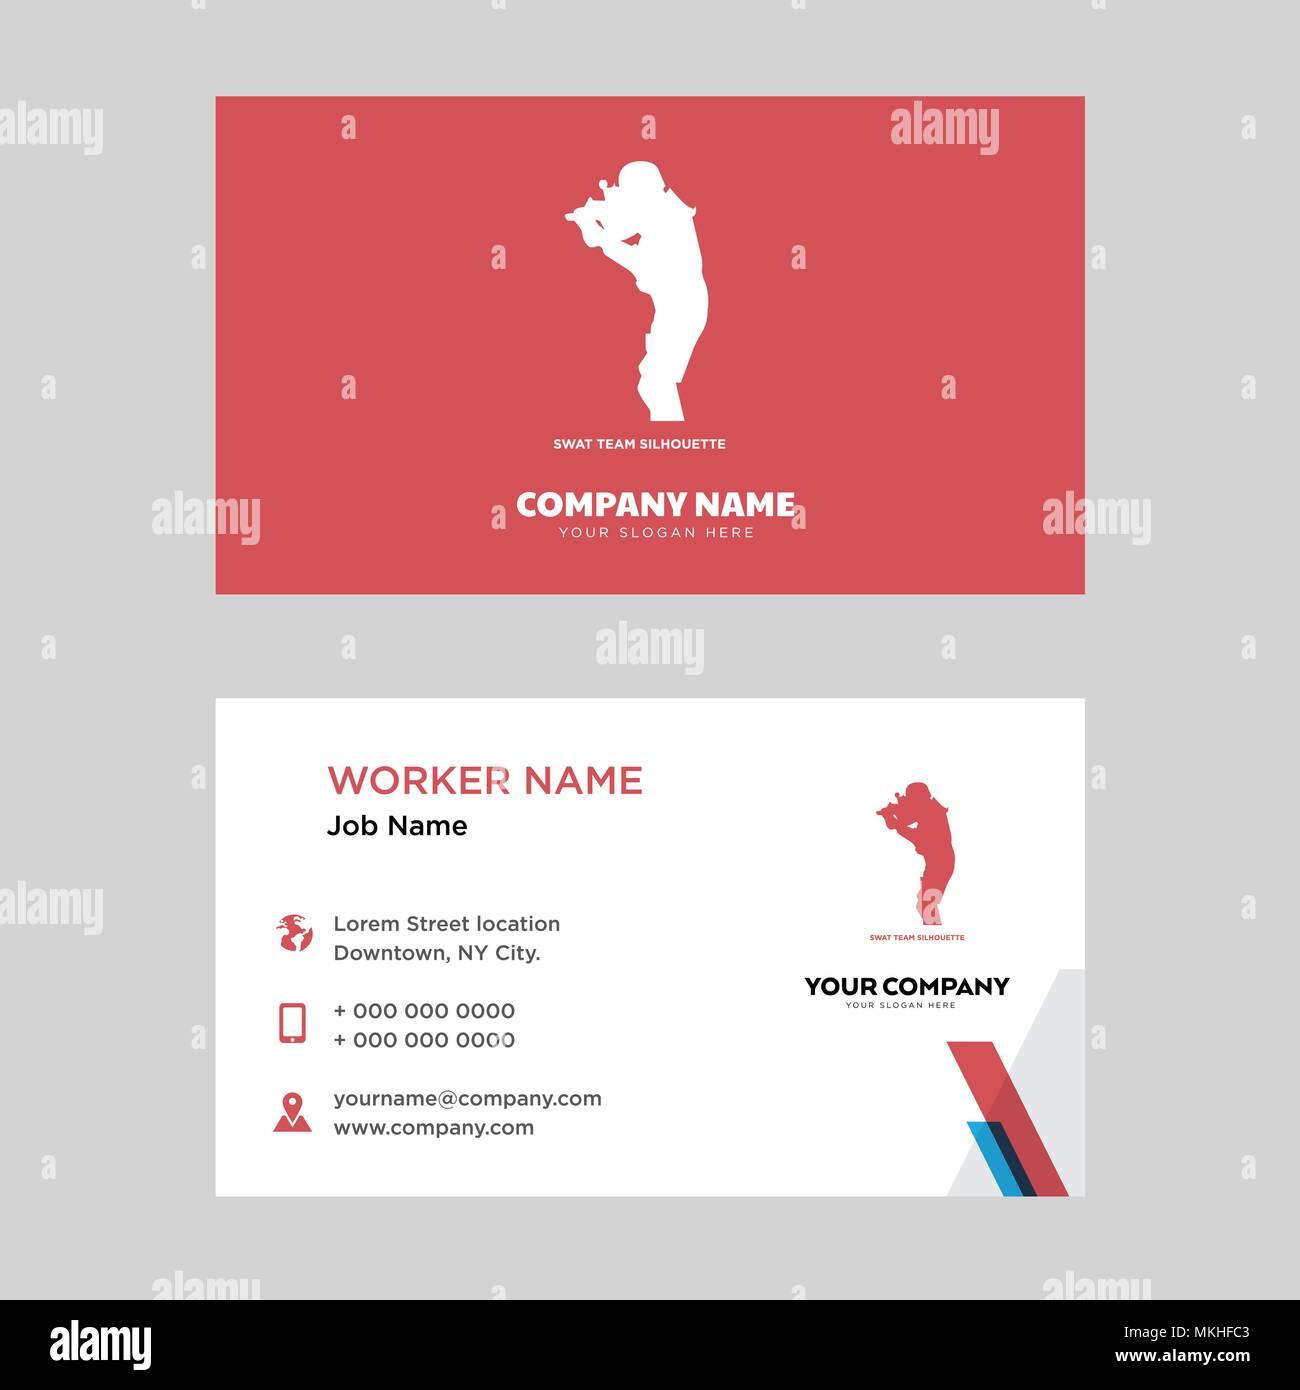 Swat team business card design template visiting for your company swat team business card design template visiting for your company modern horizontal identity card vector colourmoves